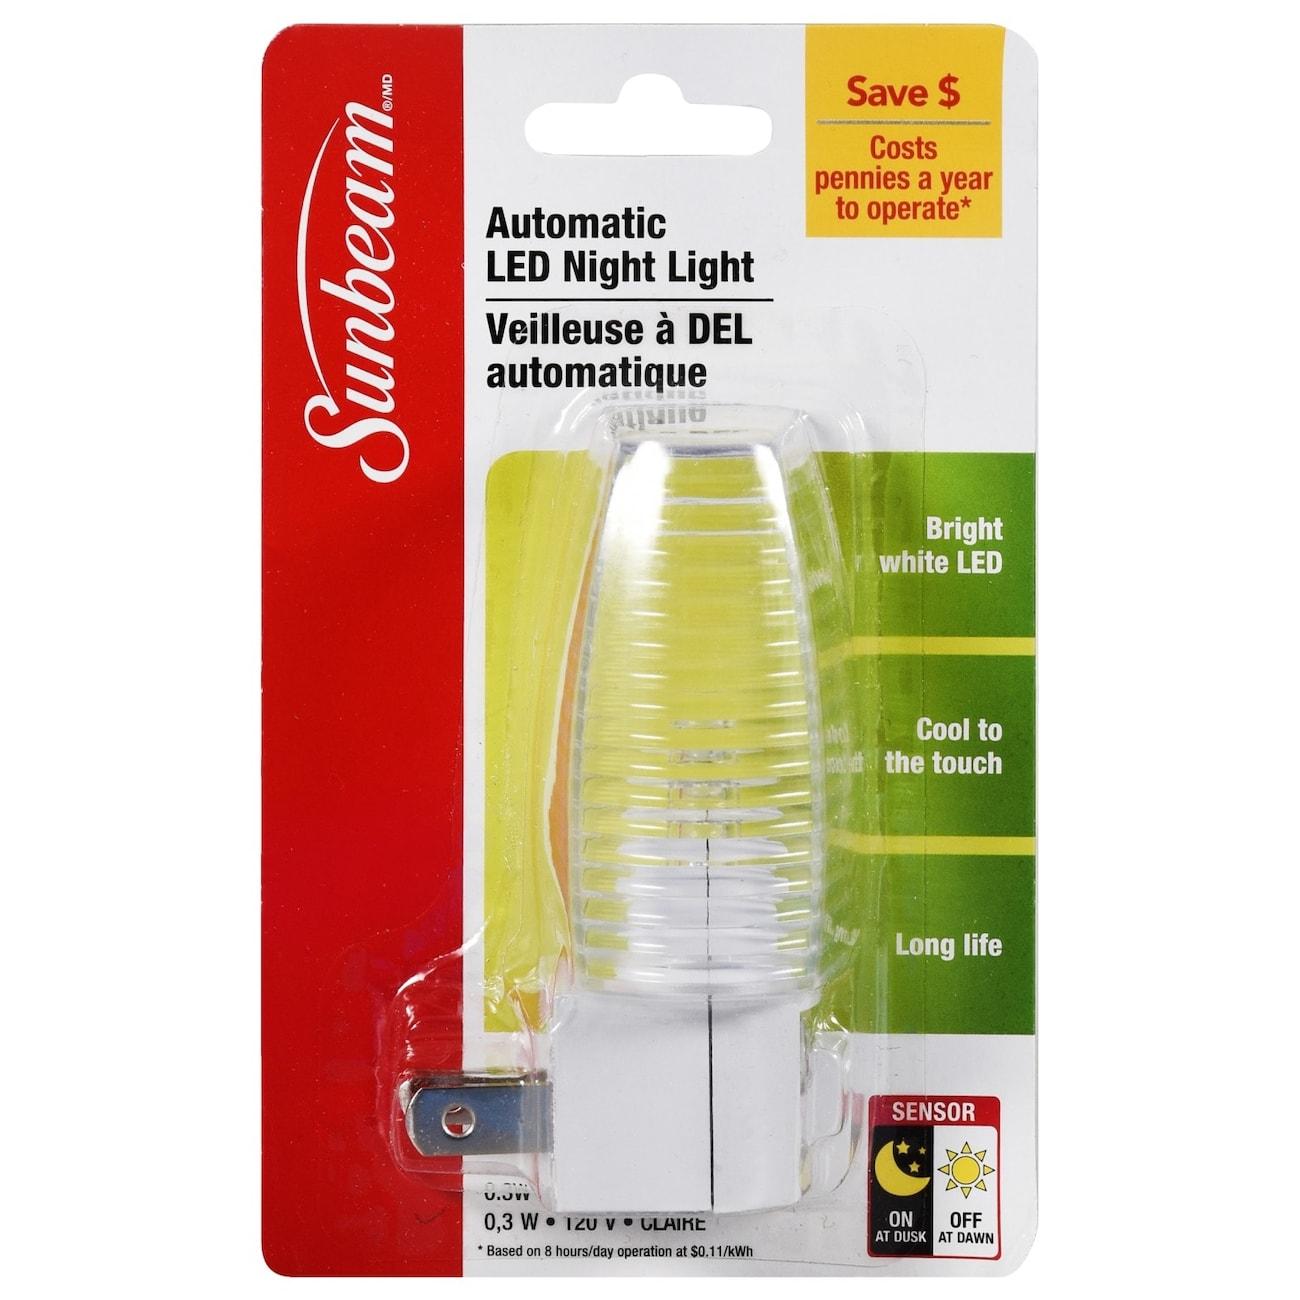 Sunbeam Automatic LED Night Lights